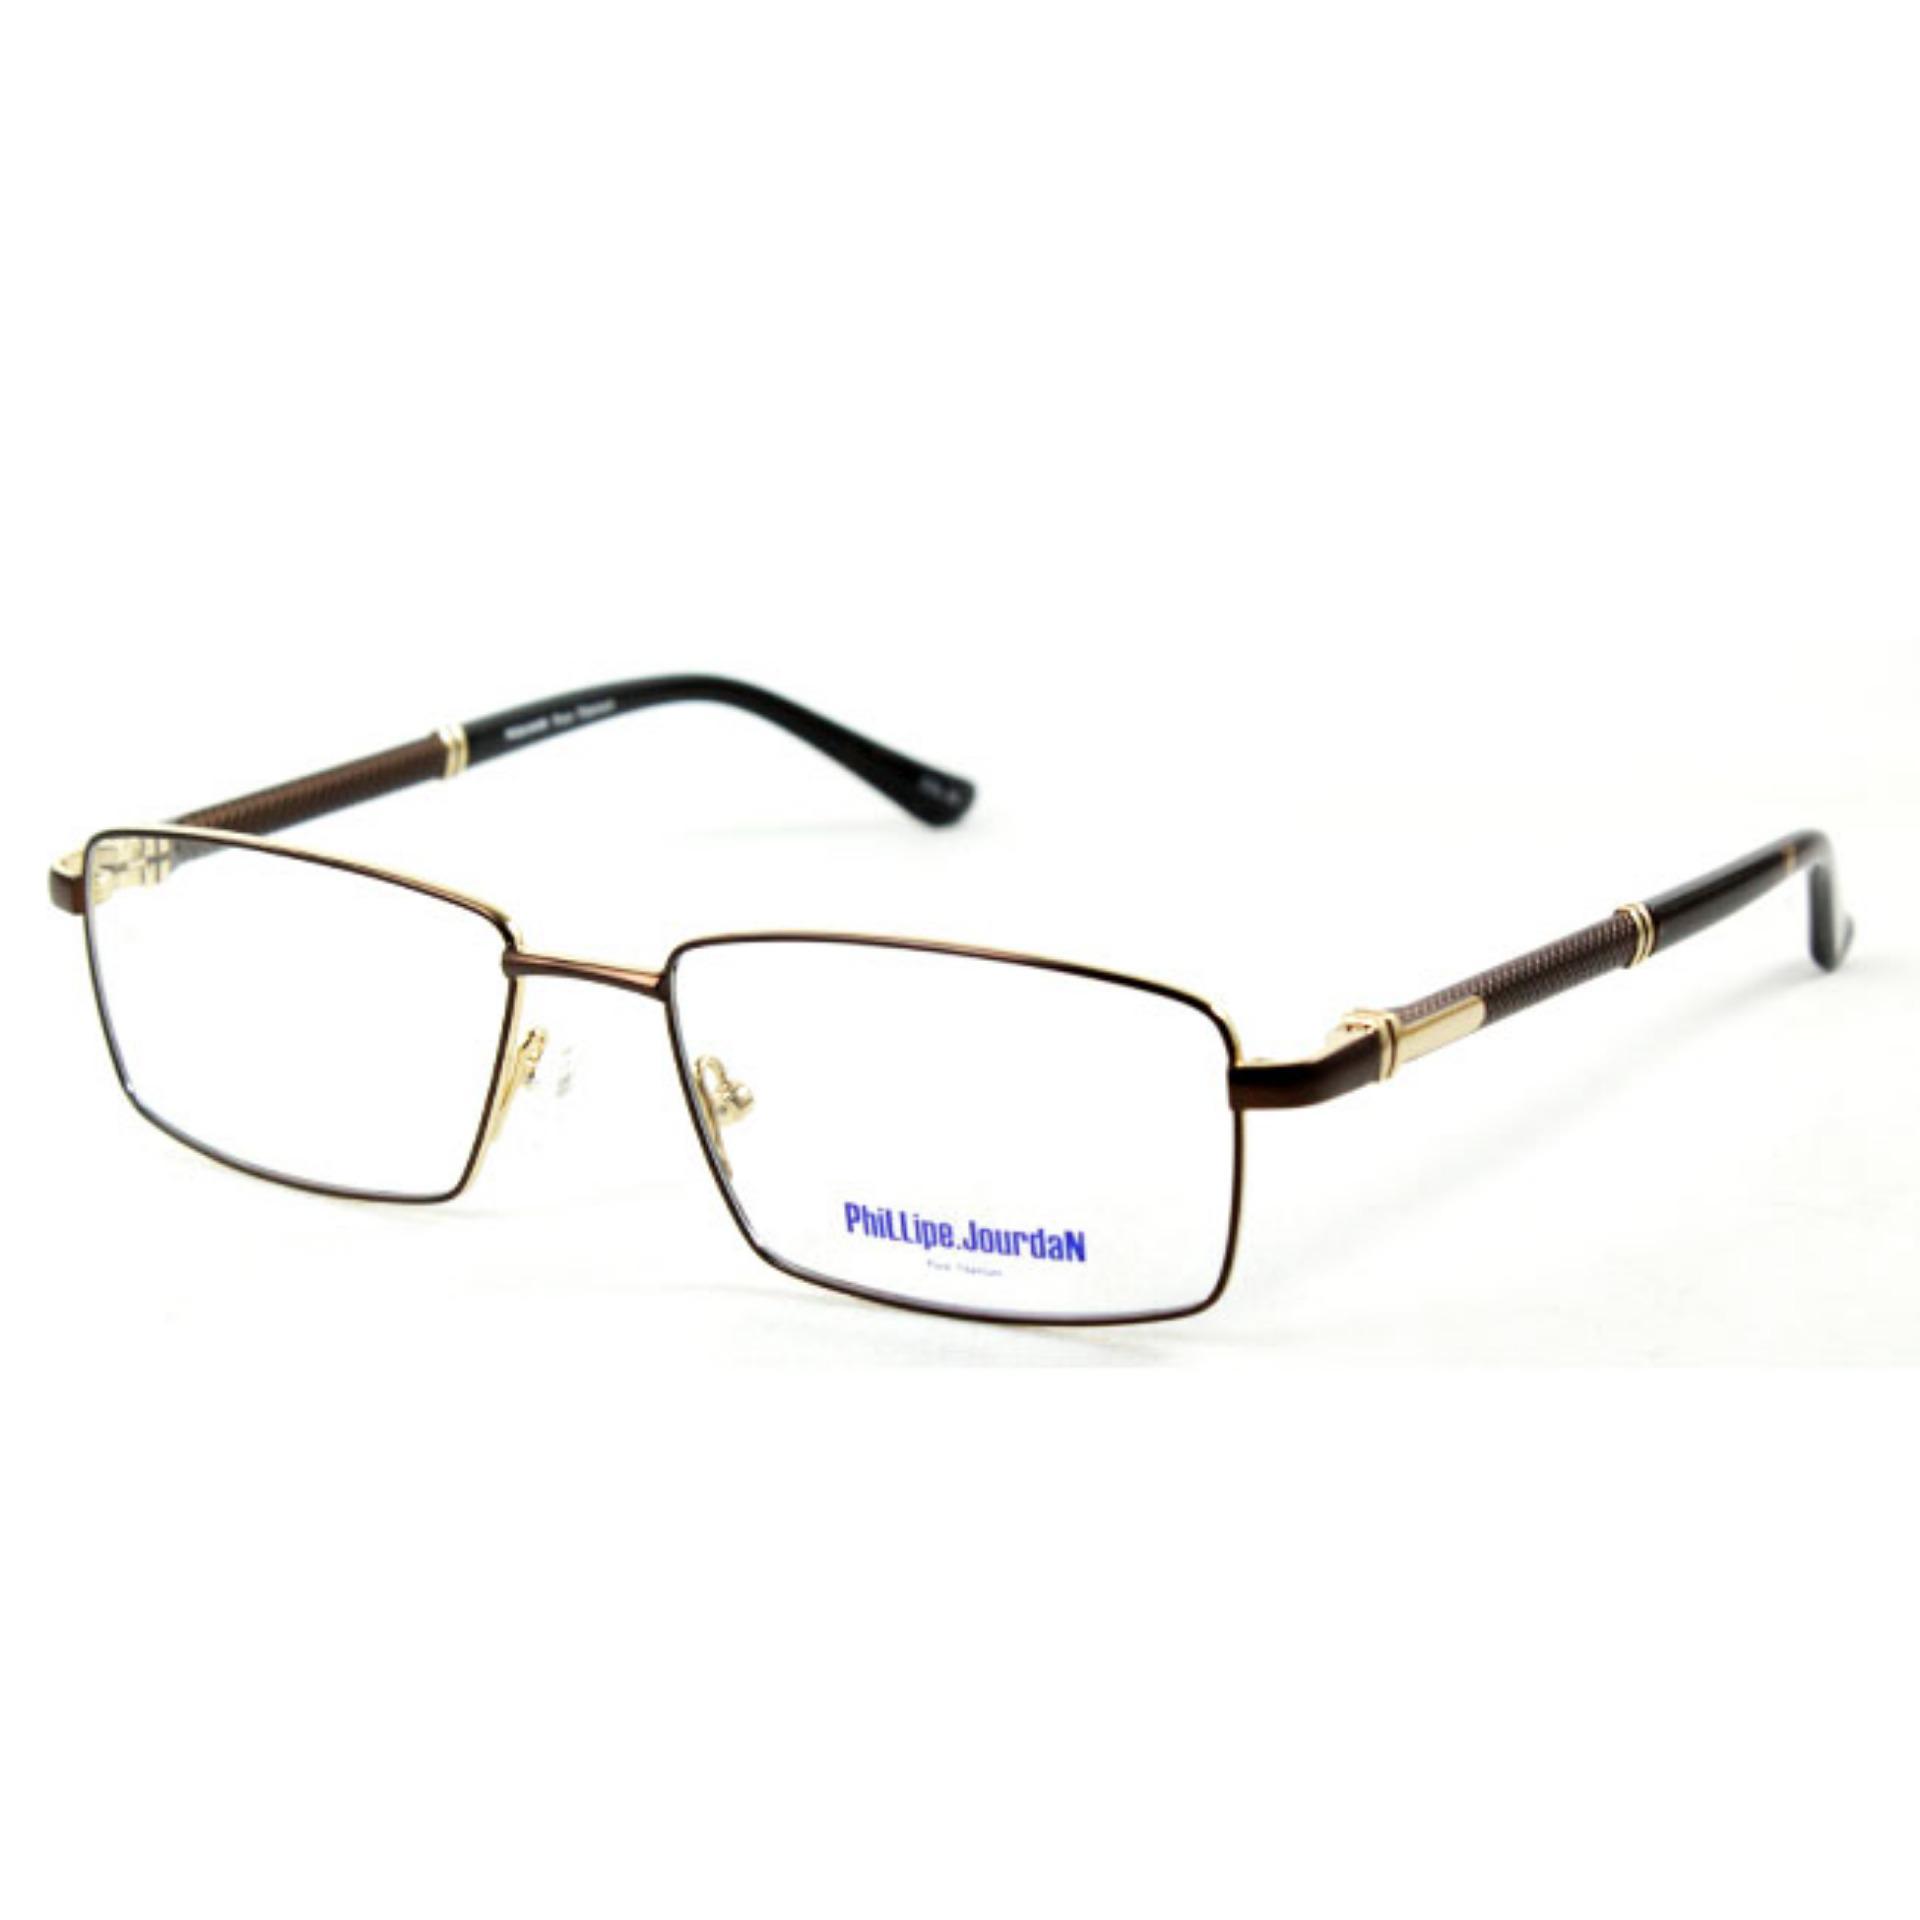 ... Frame Aluminium Source · Fashion Stallane miopia bingkai kacamata Optik kacamata polos aluminium kacamata setengah bingkai kacamata bisnis untuk pria